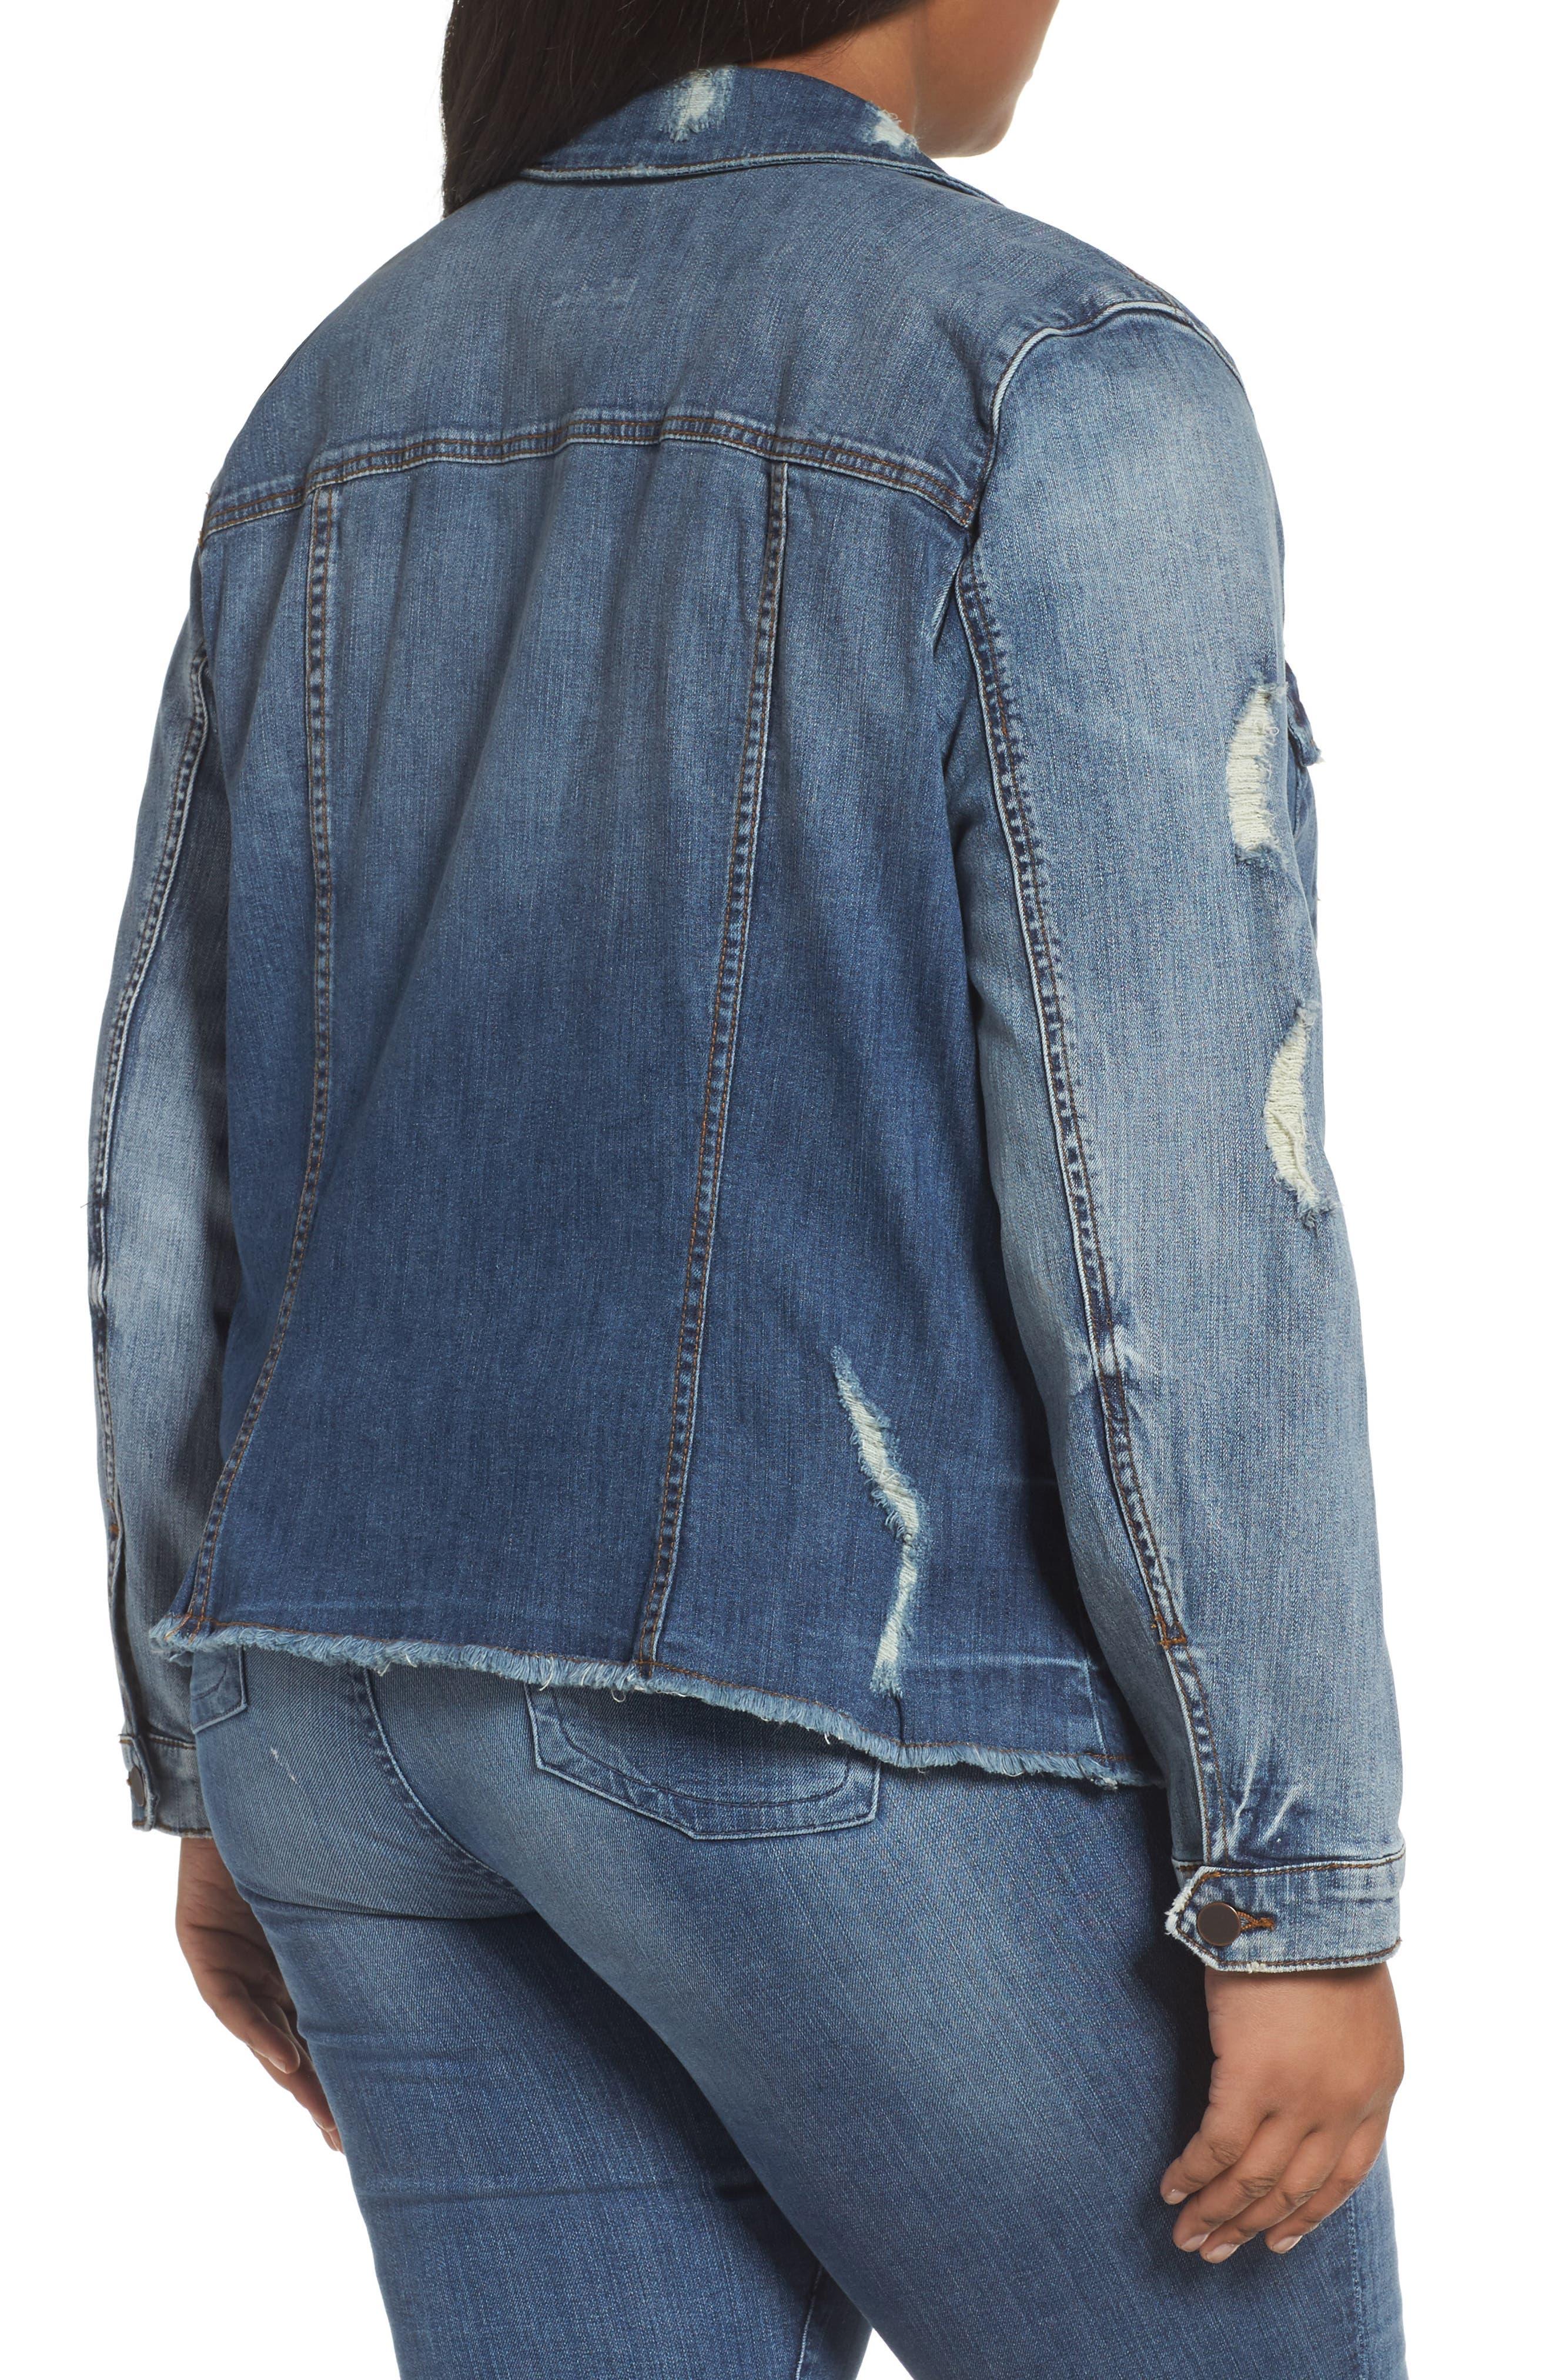 Distressed Denim Jacket,                             Alternate thumbnail 2, color,                             400